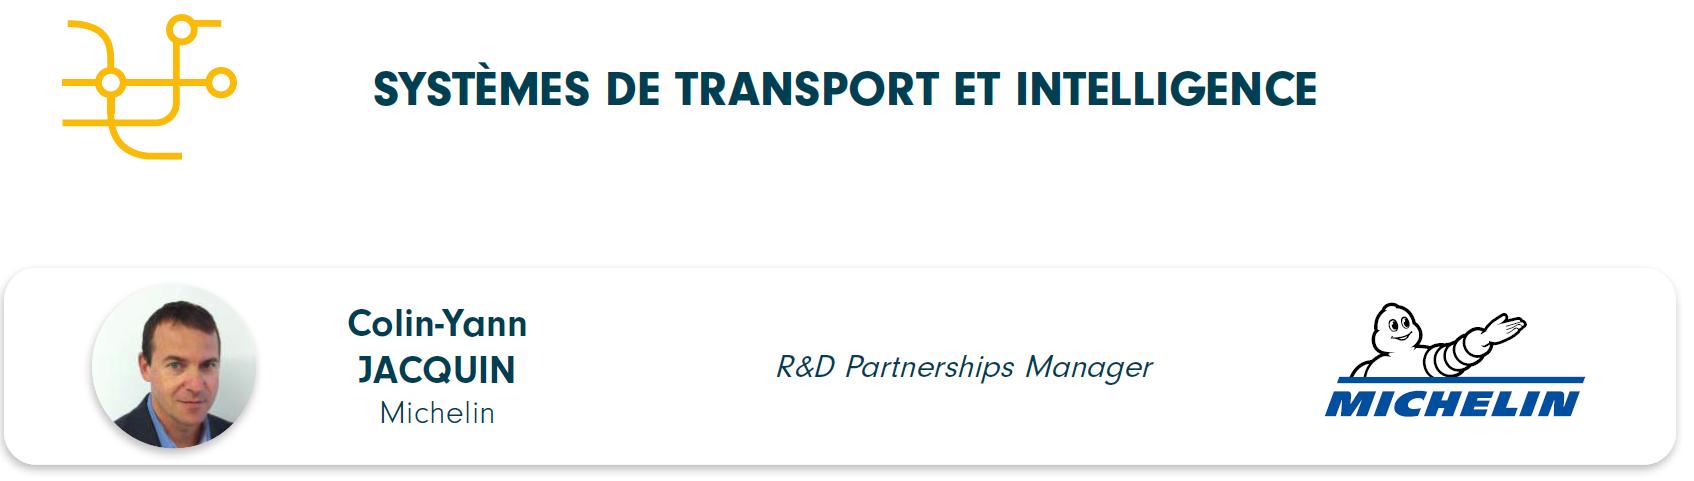 directeur de programme transport intelligent